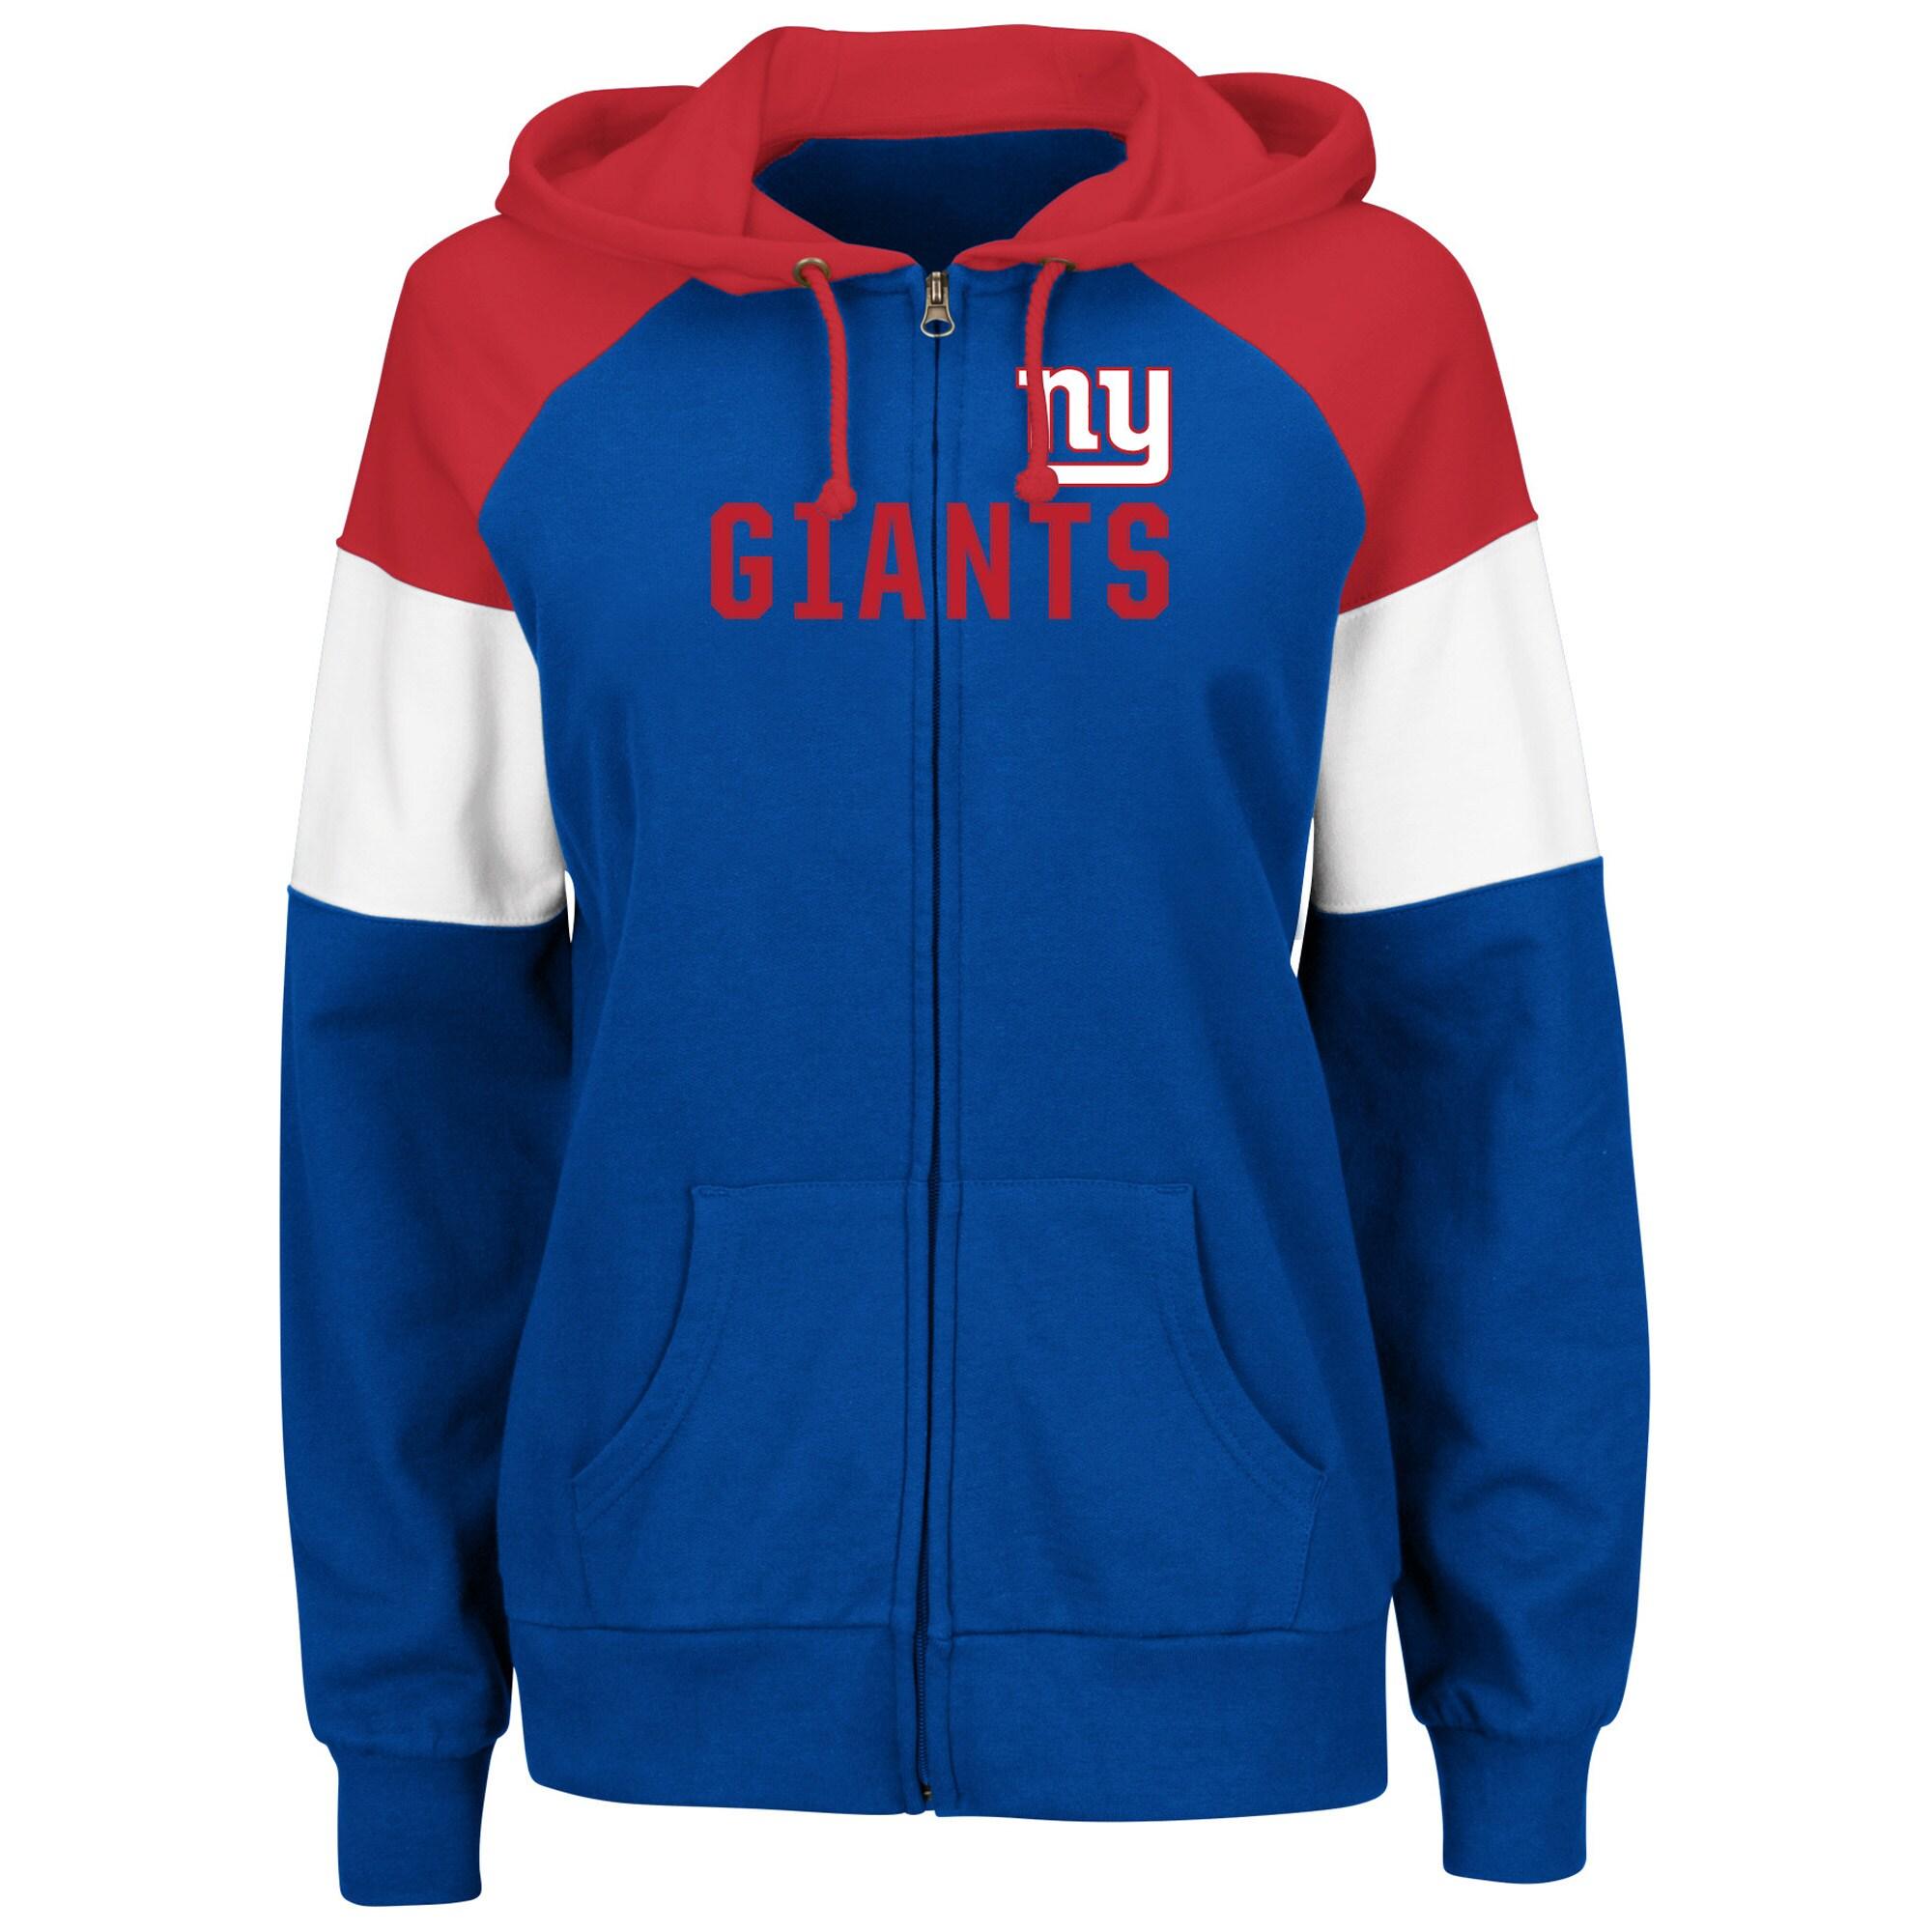 New York Giants Majestic Women's Hot Route Full-Zip Hoodie - Royal